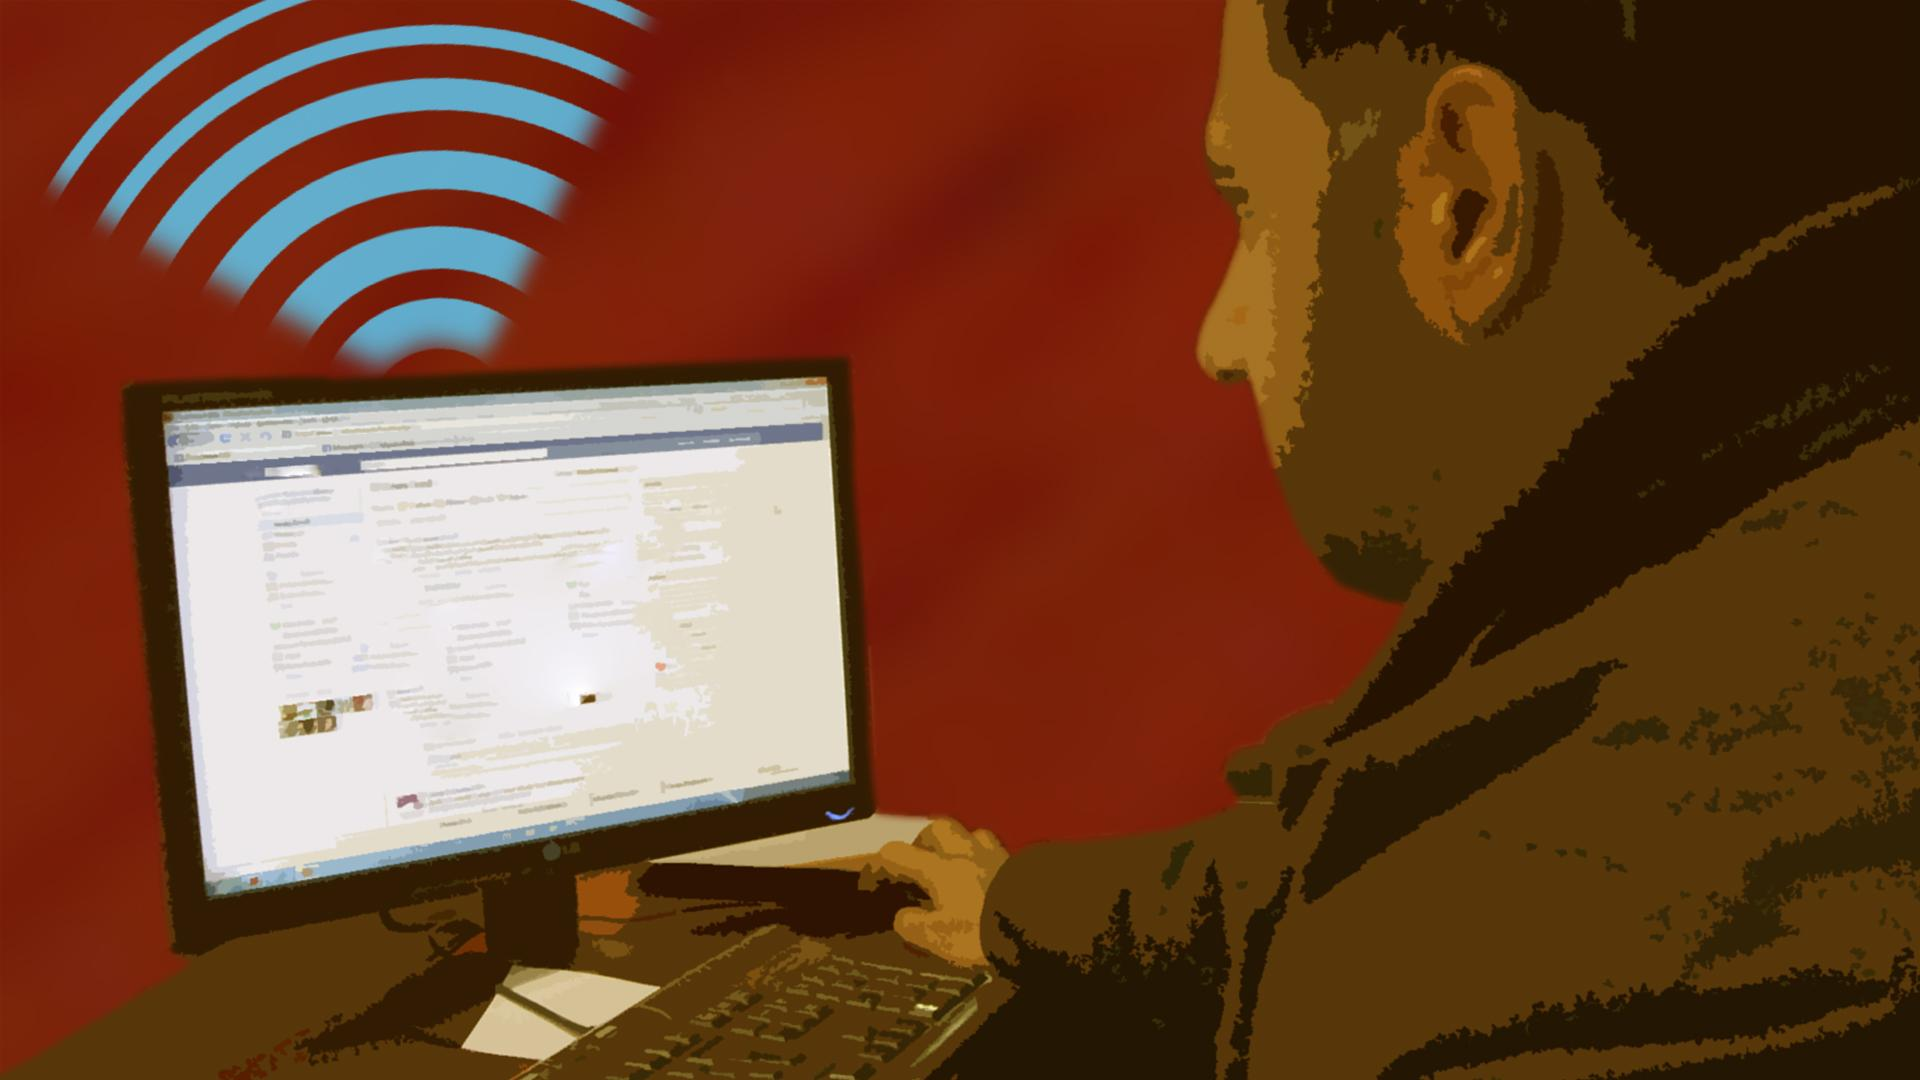 computer-wifi-access_259536